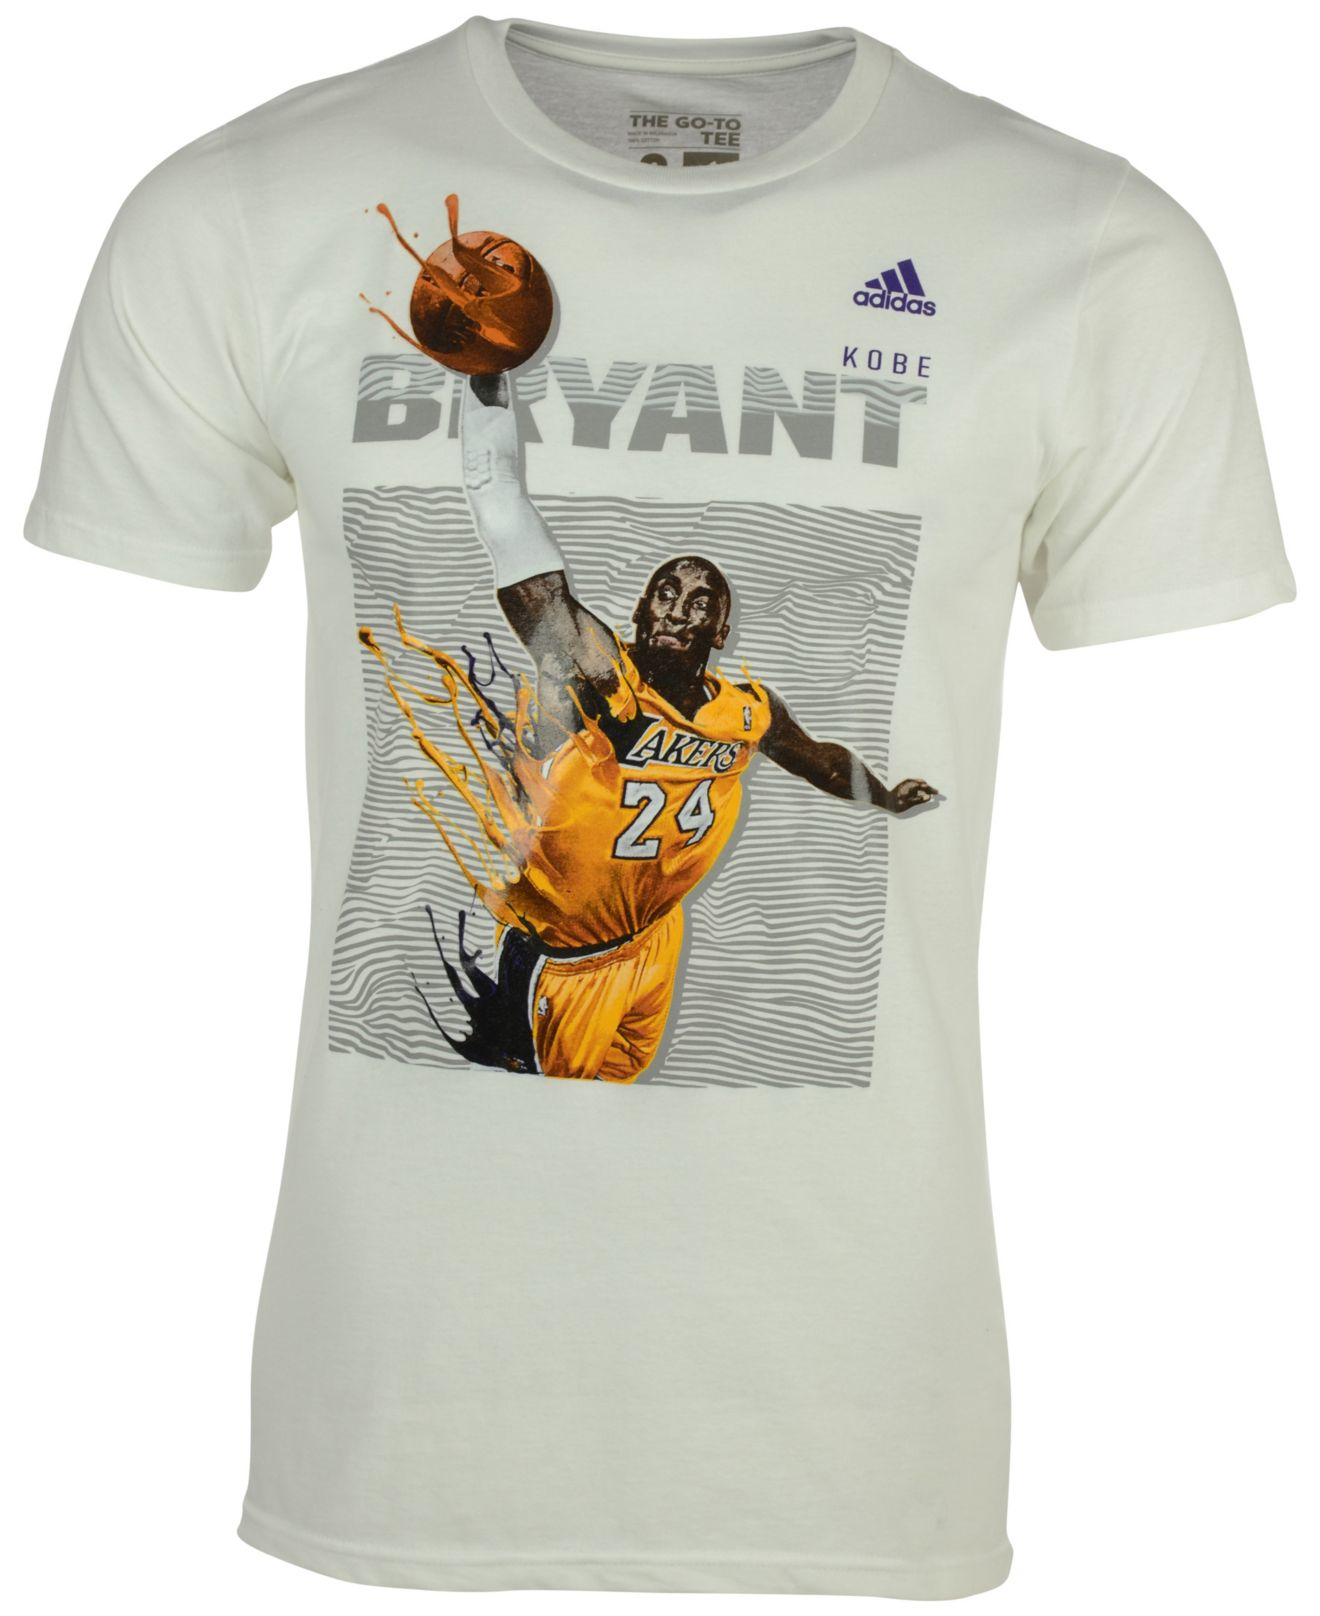 bryant lakers t-shirt adidas